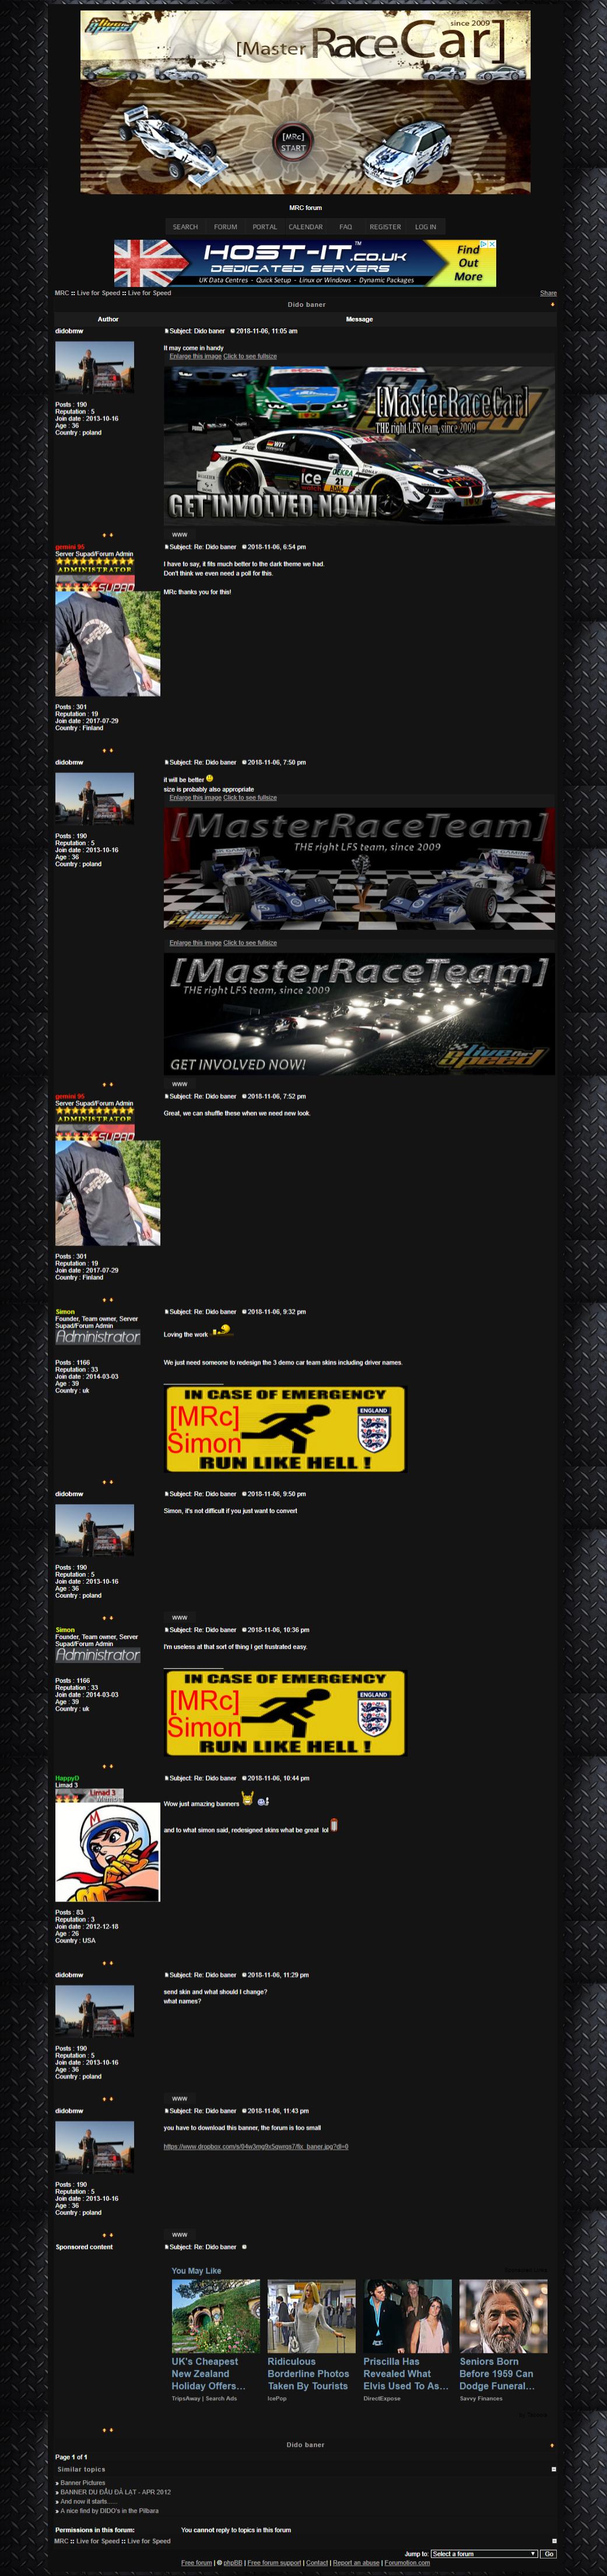 [Image: screencapture-masterracecar-forumactif-t...-11-23.jpg]